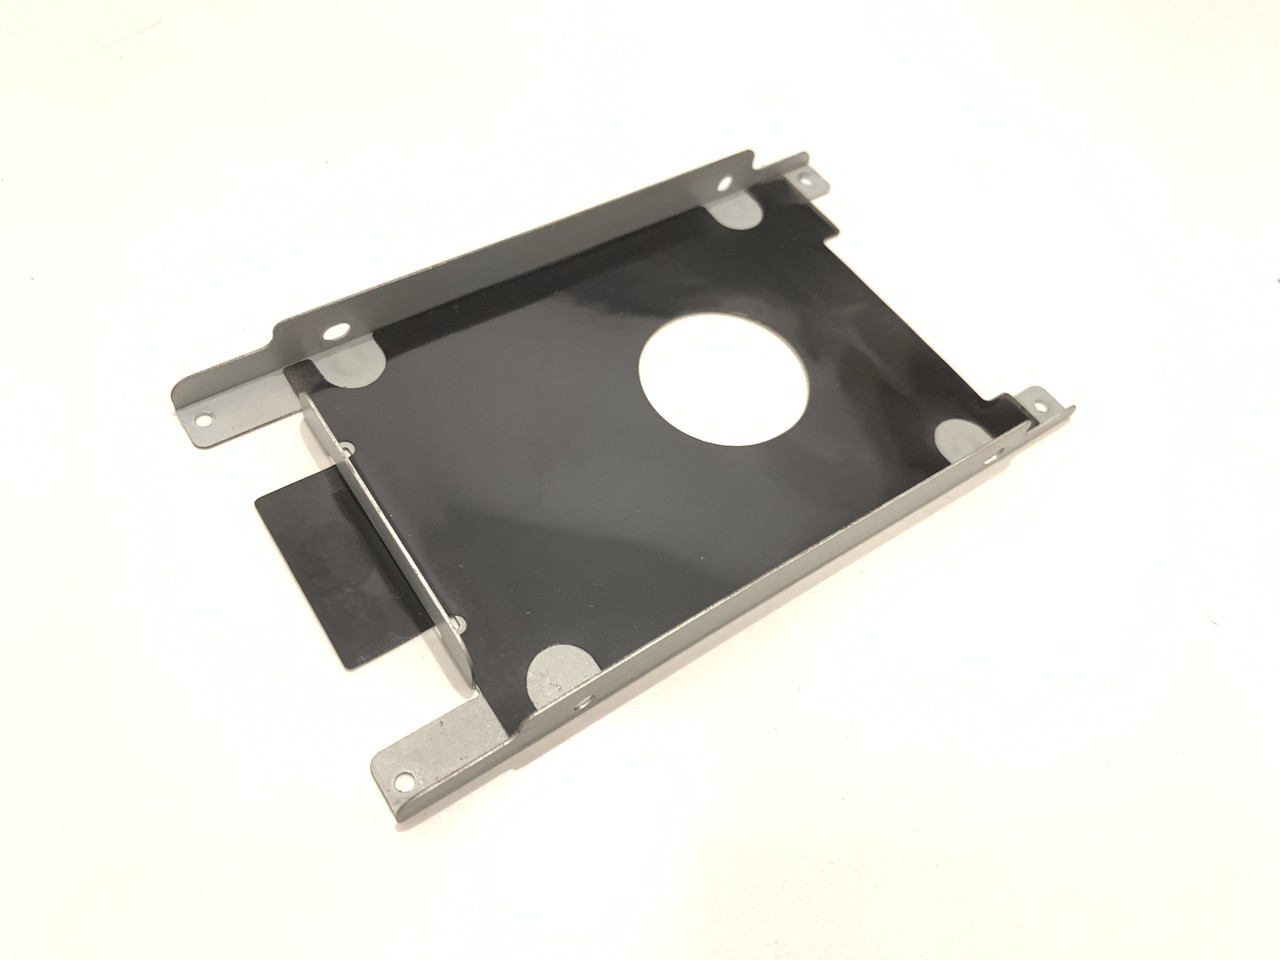 Запчасти для ноутбука Asus K52D - HDD Caddy, карман, крепление PN: 13GNXM10M10X-1